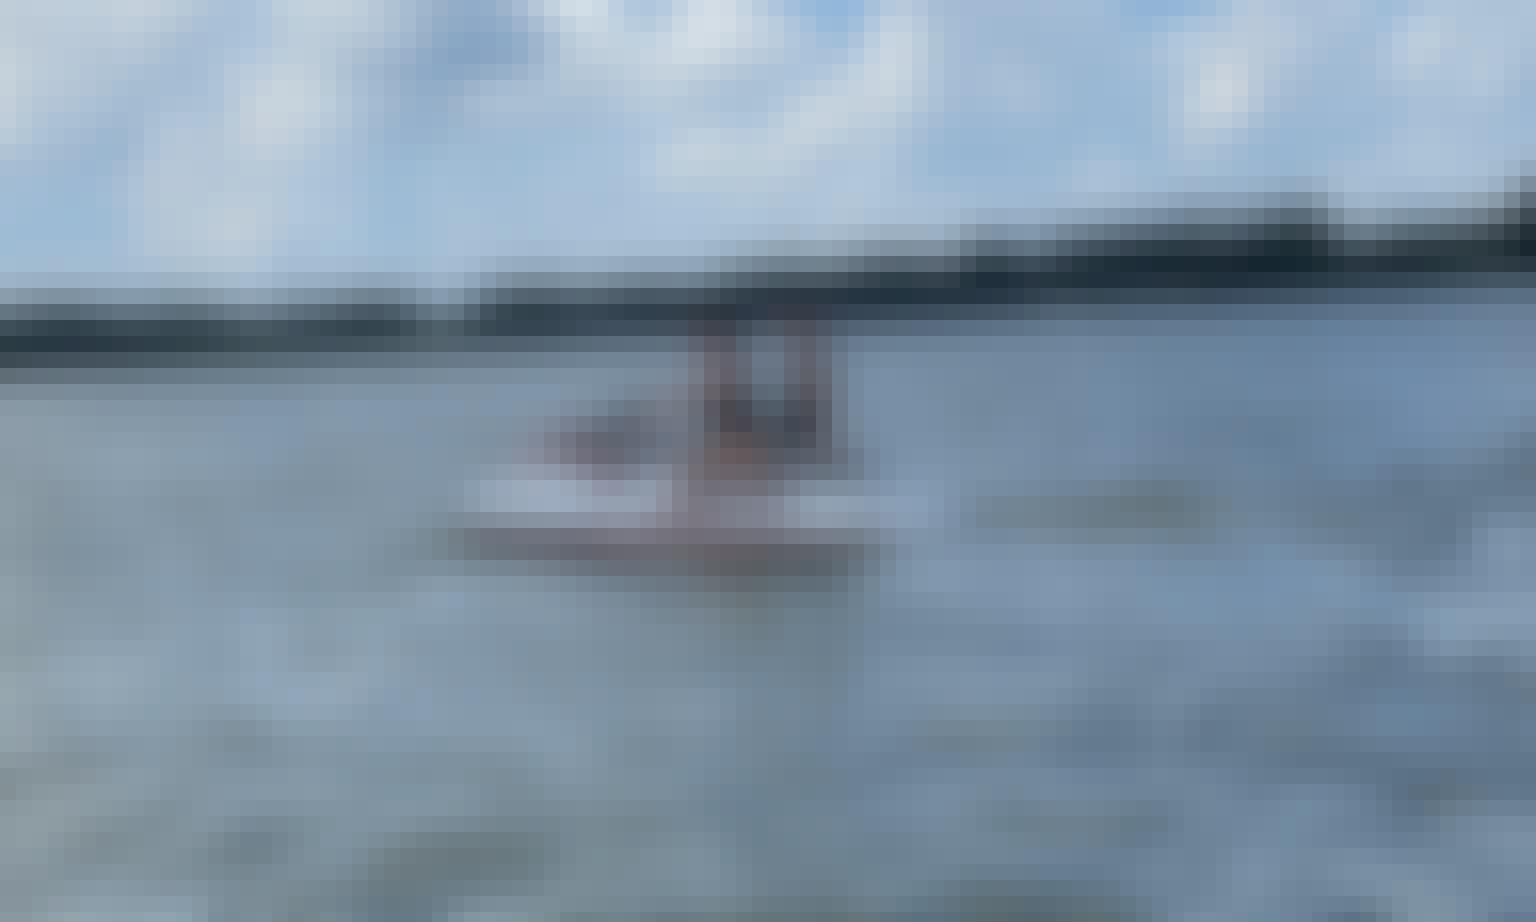 2020 YAMAHA EX SPORT IN LAKE TRAVIS